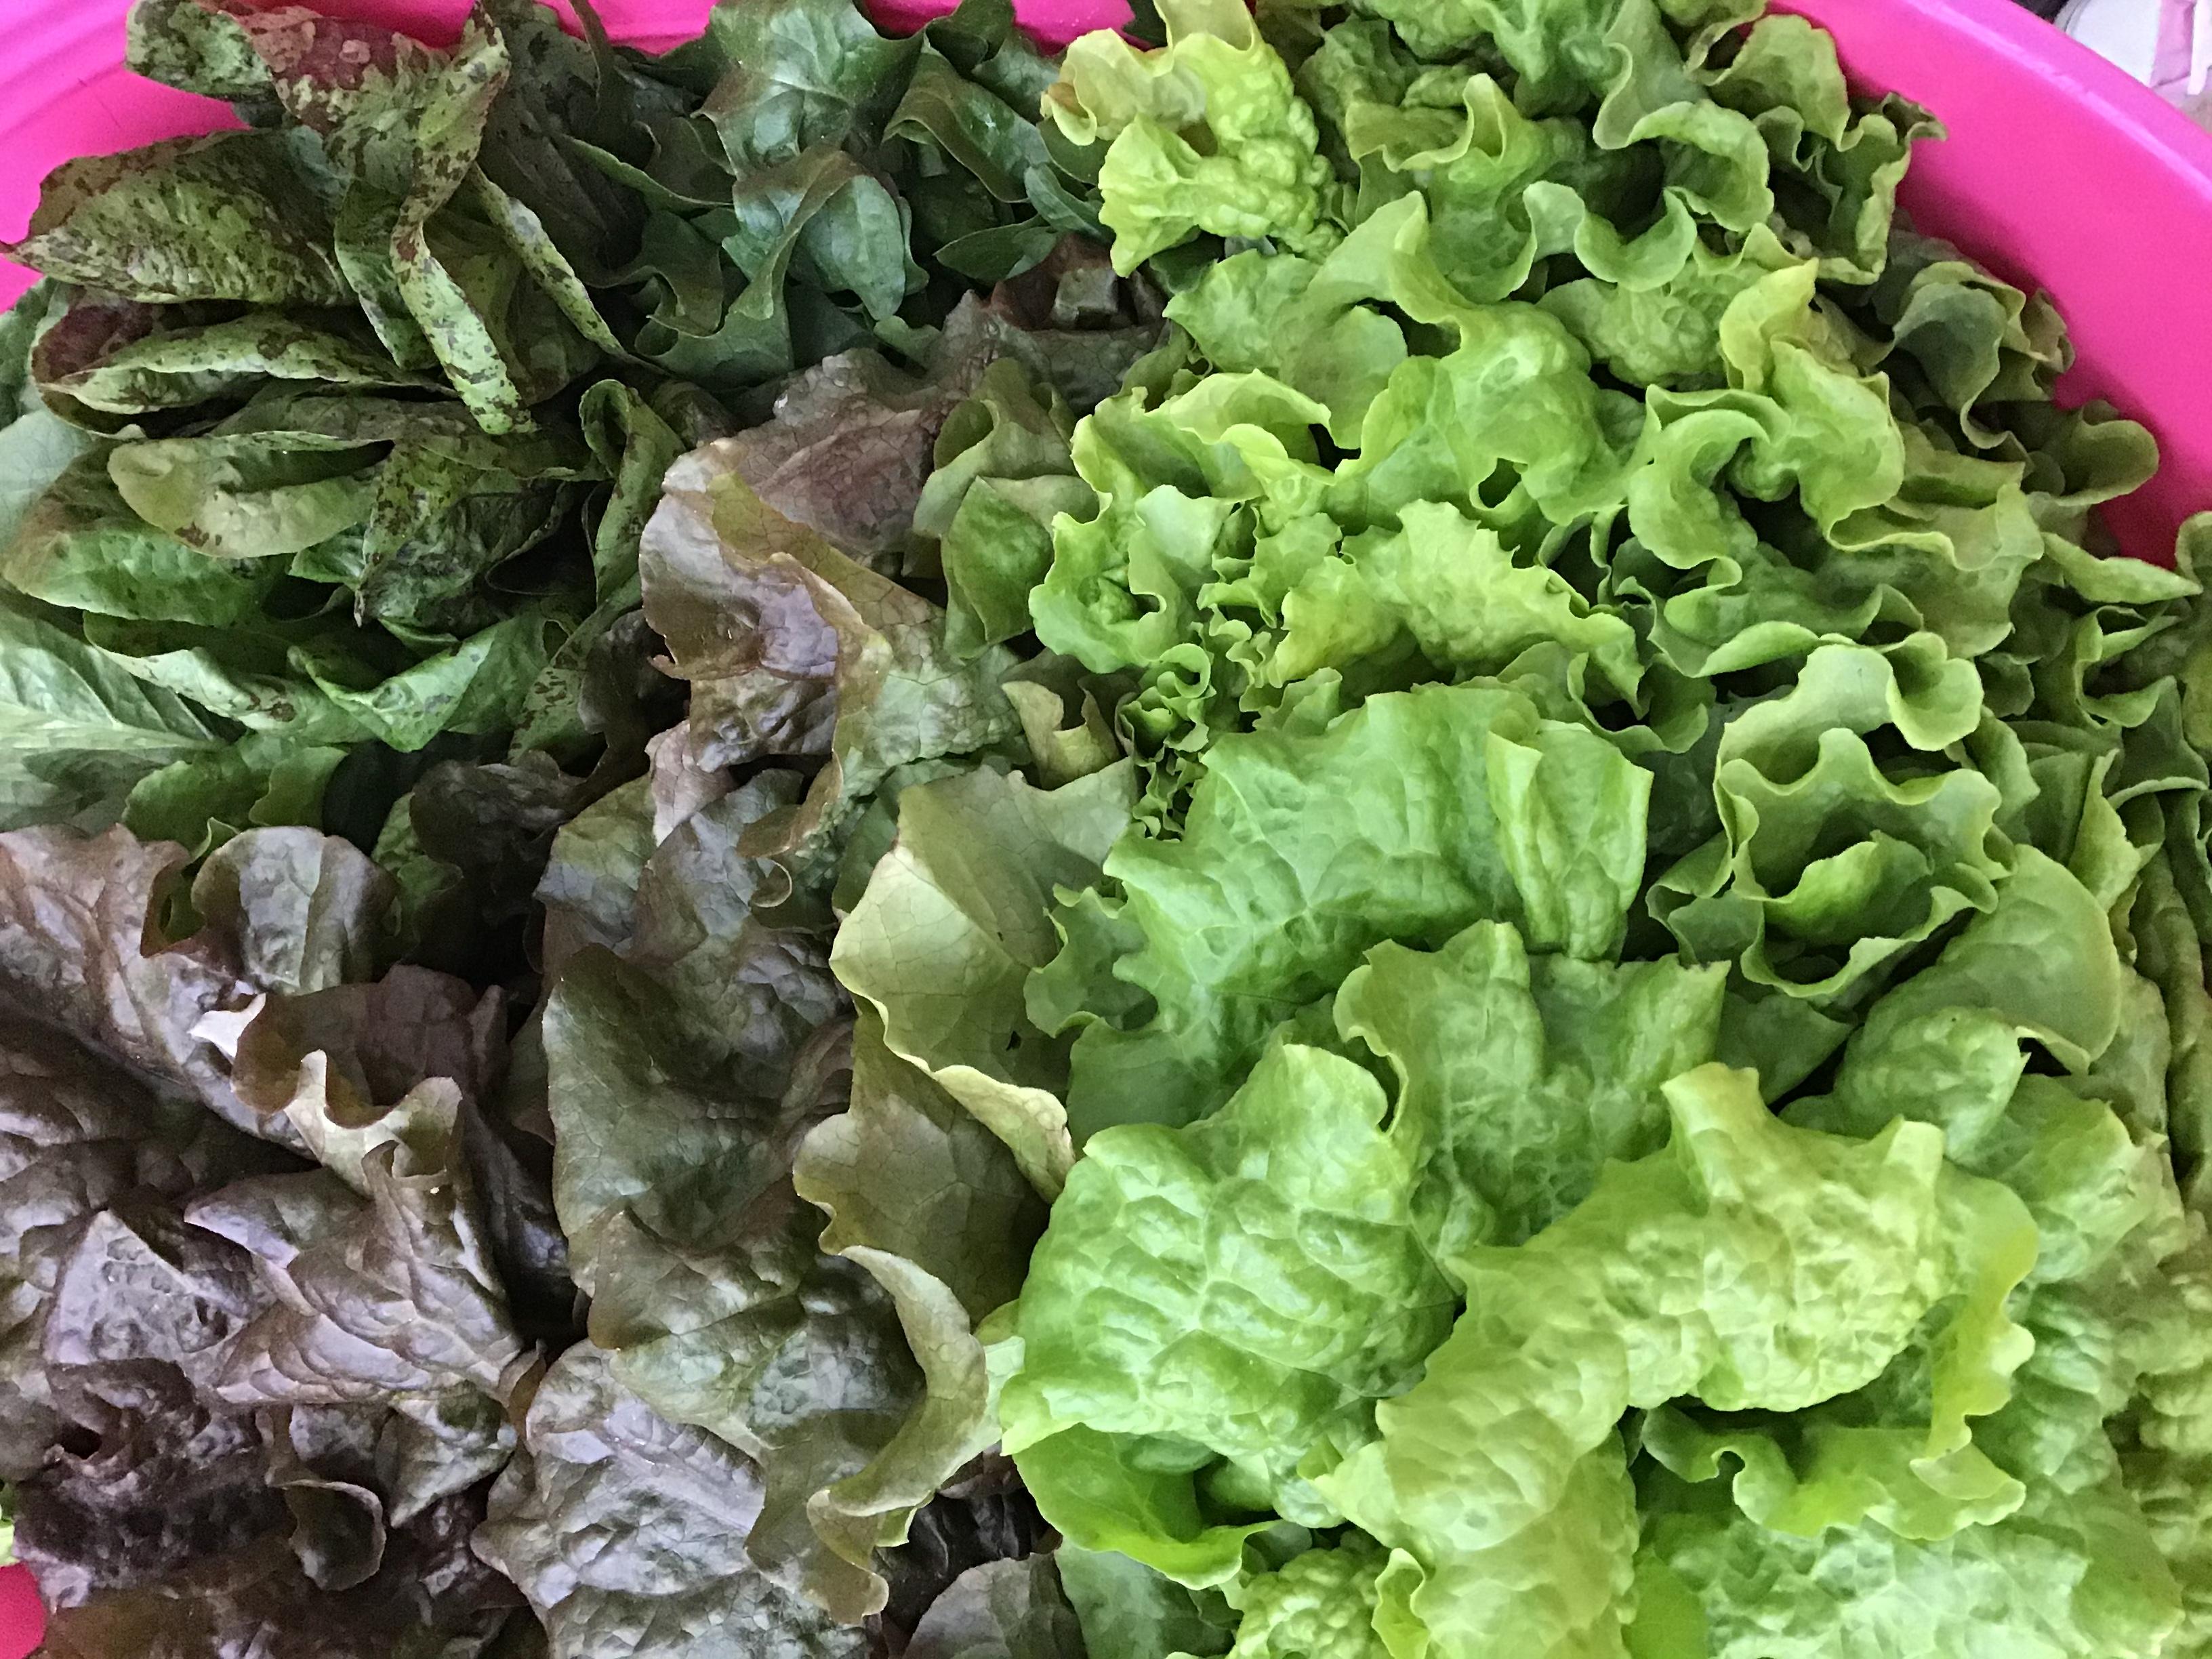 Organic and Local Veggies